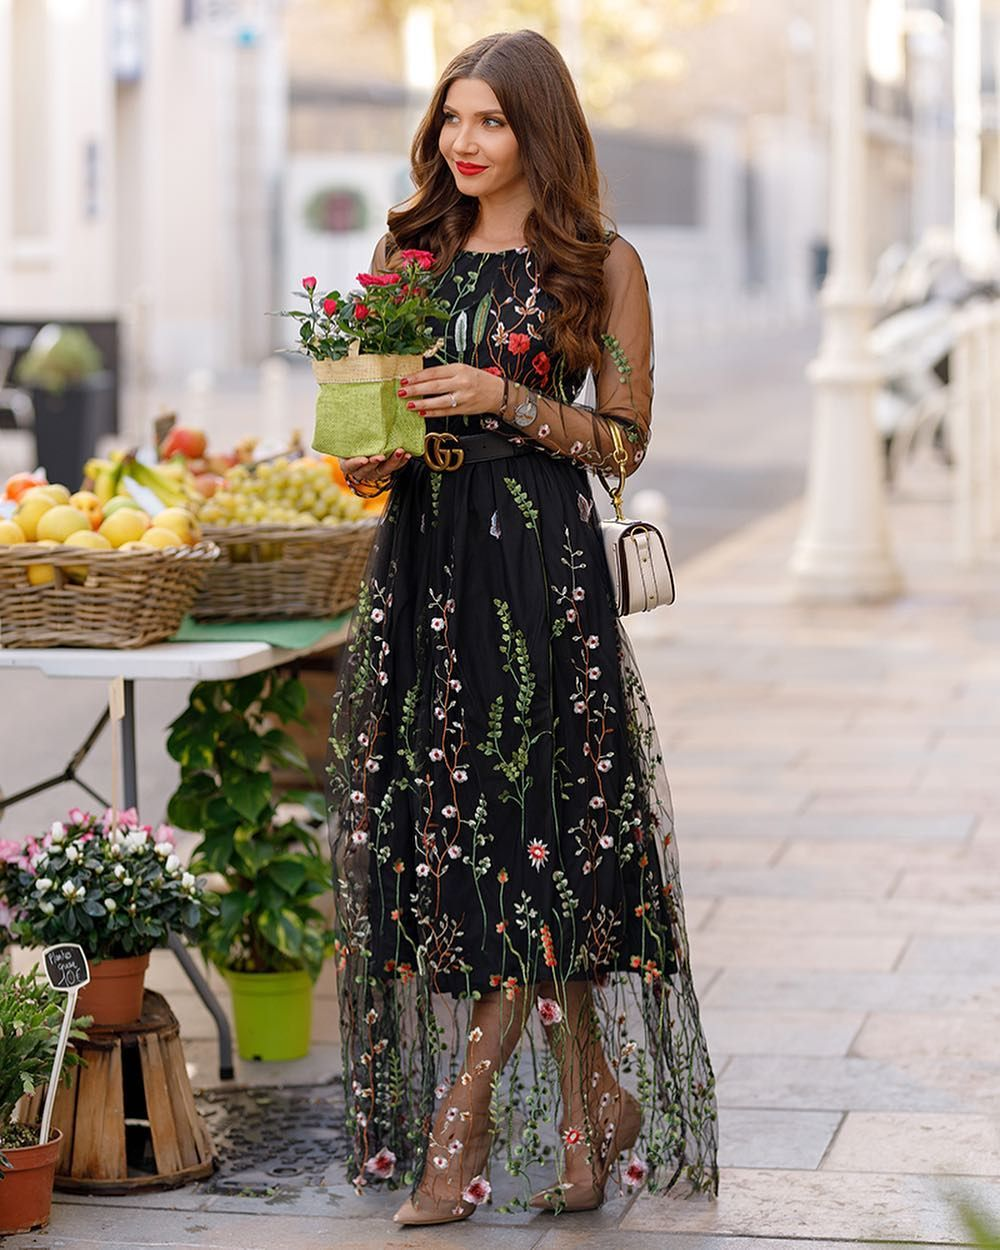 472488e8661 Related Posts Fall in CannesPest-BudaEzeLemon scented sunsetBoho is  backDaisy dress